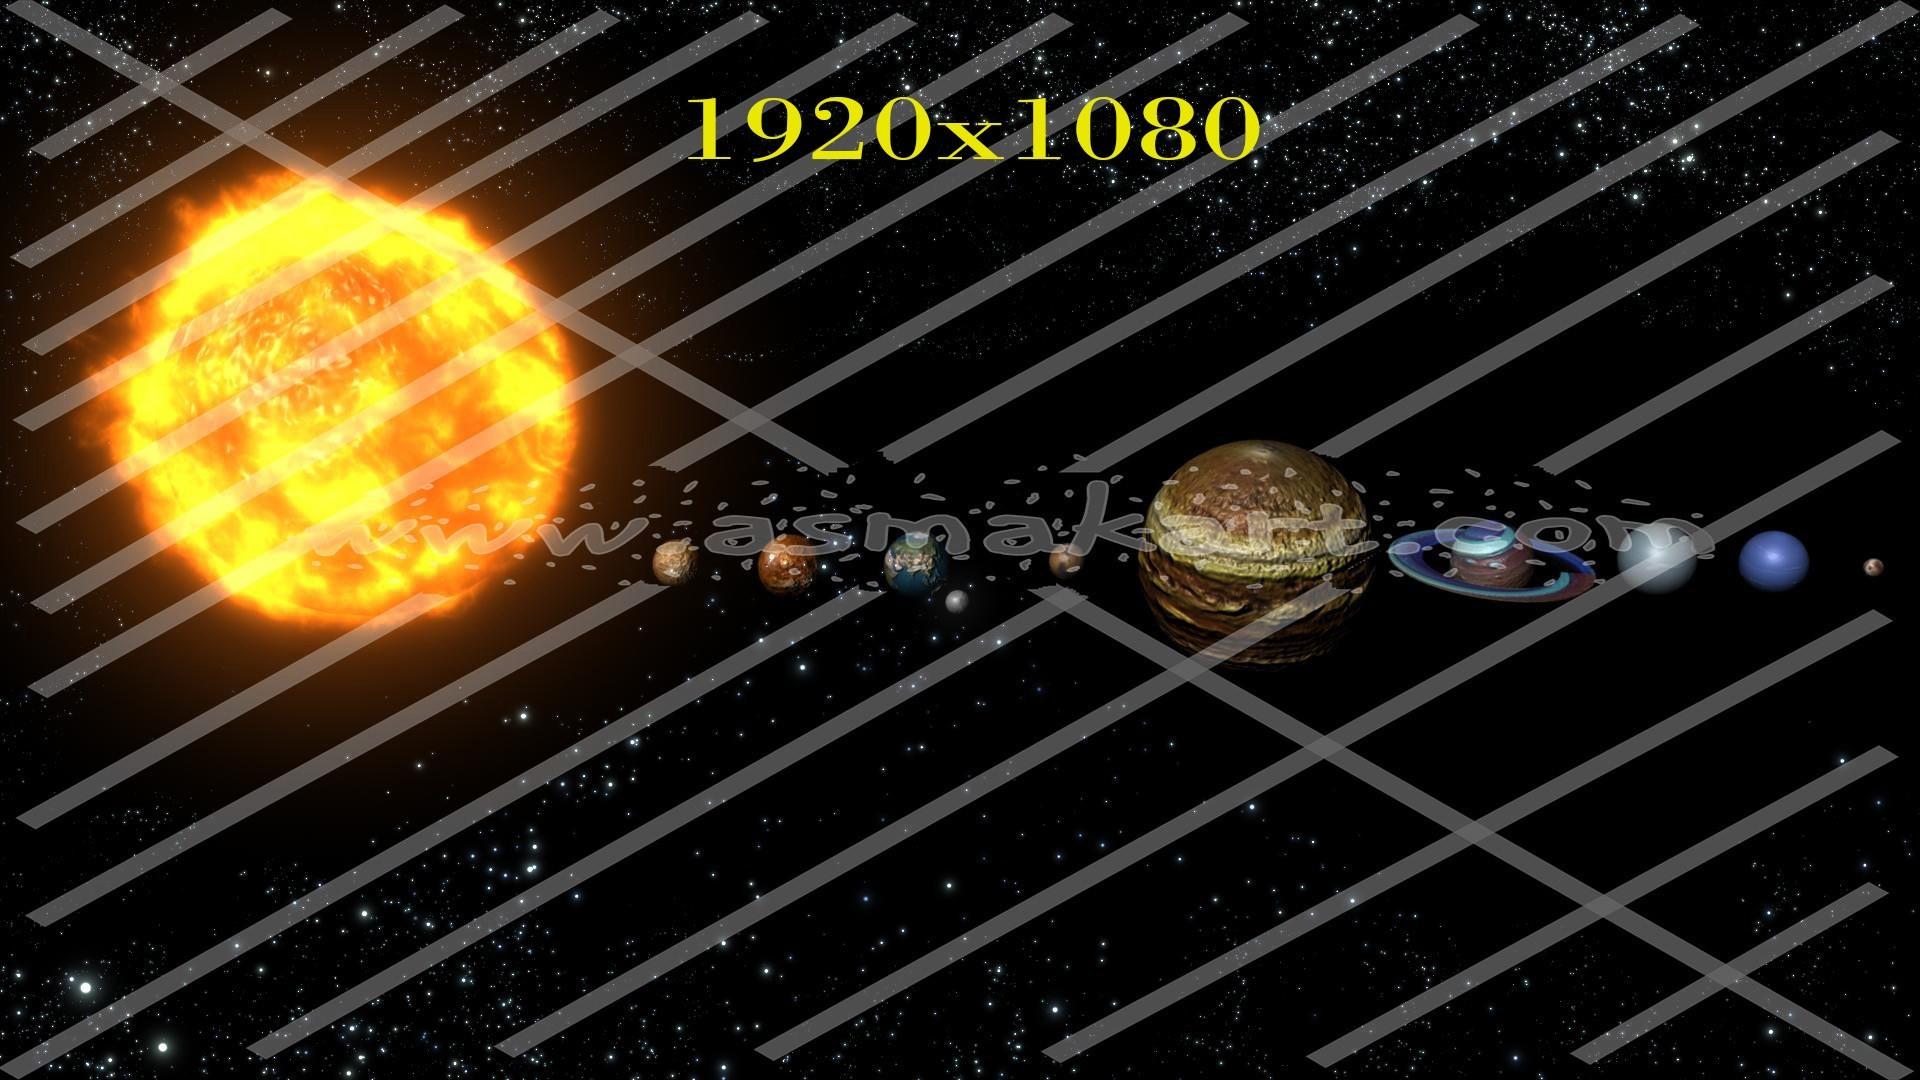 1920x1080 Solar System Wallpaper Download 2000x1200